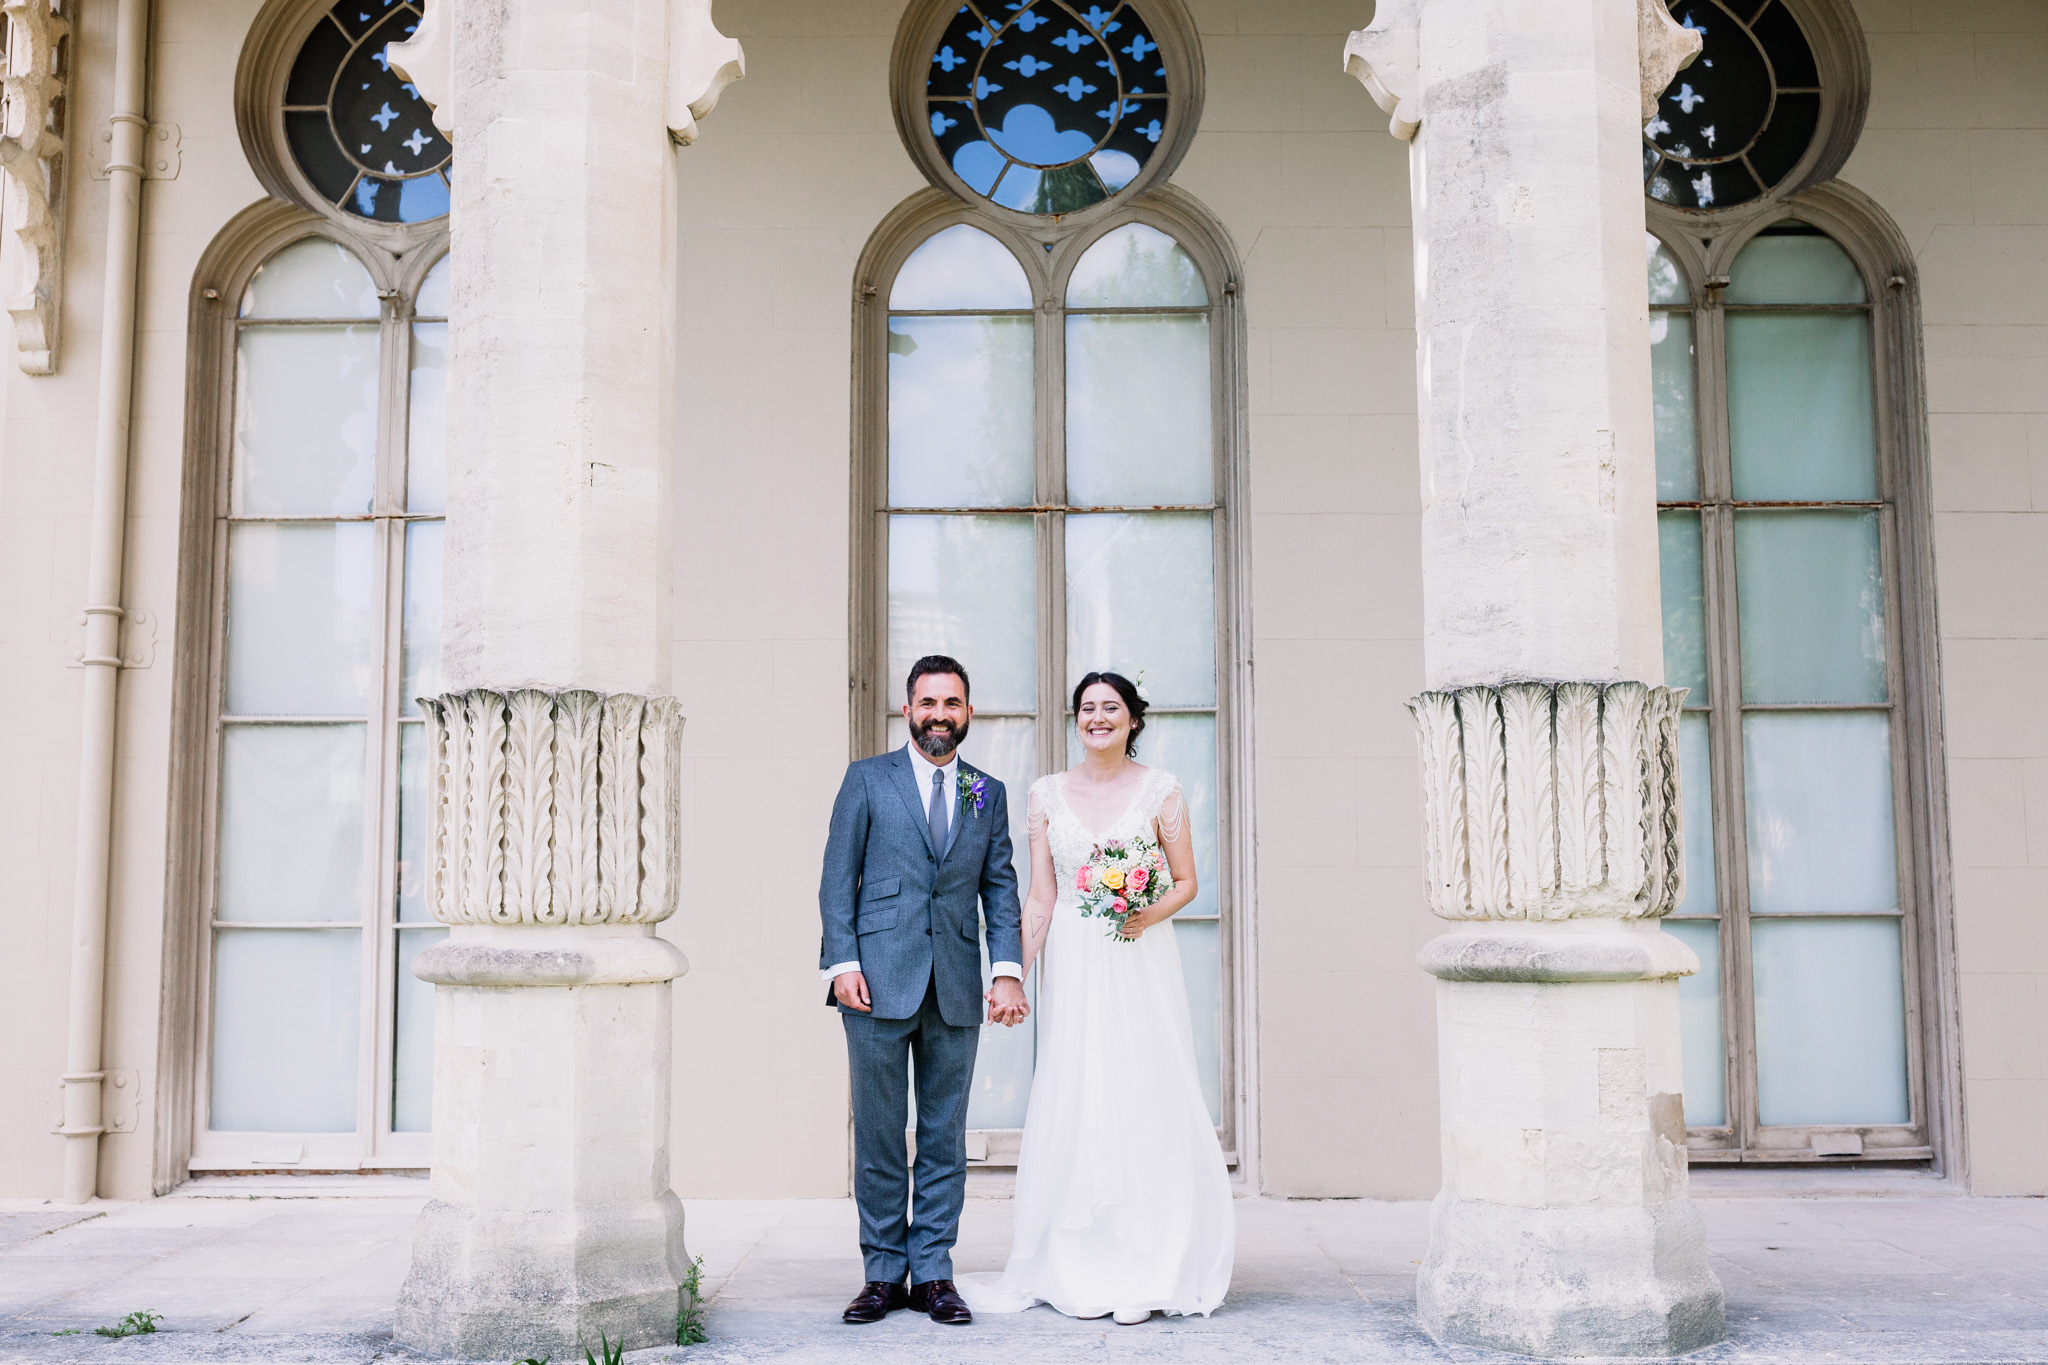 brighton pavilion wedding